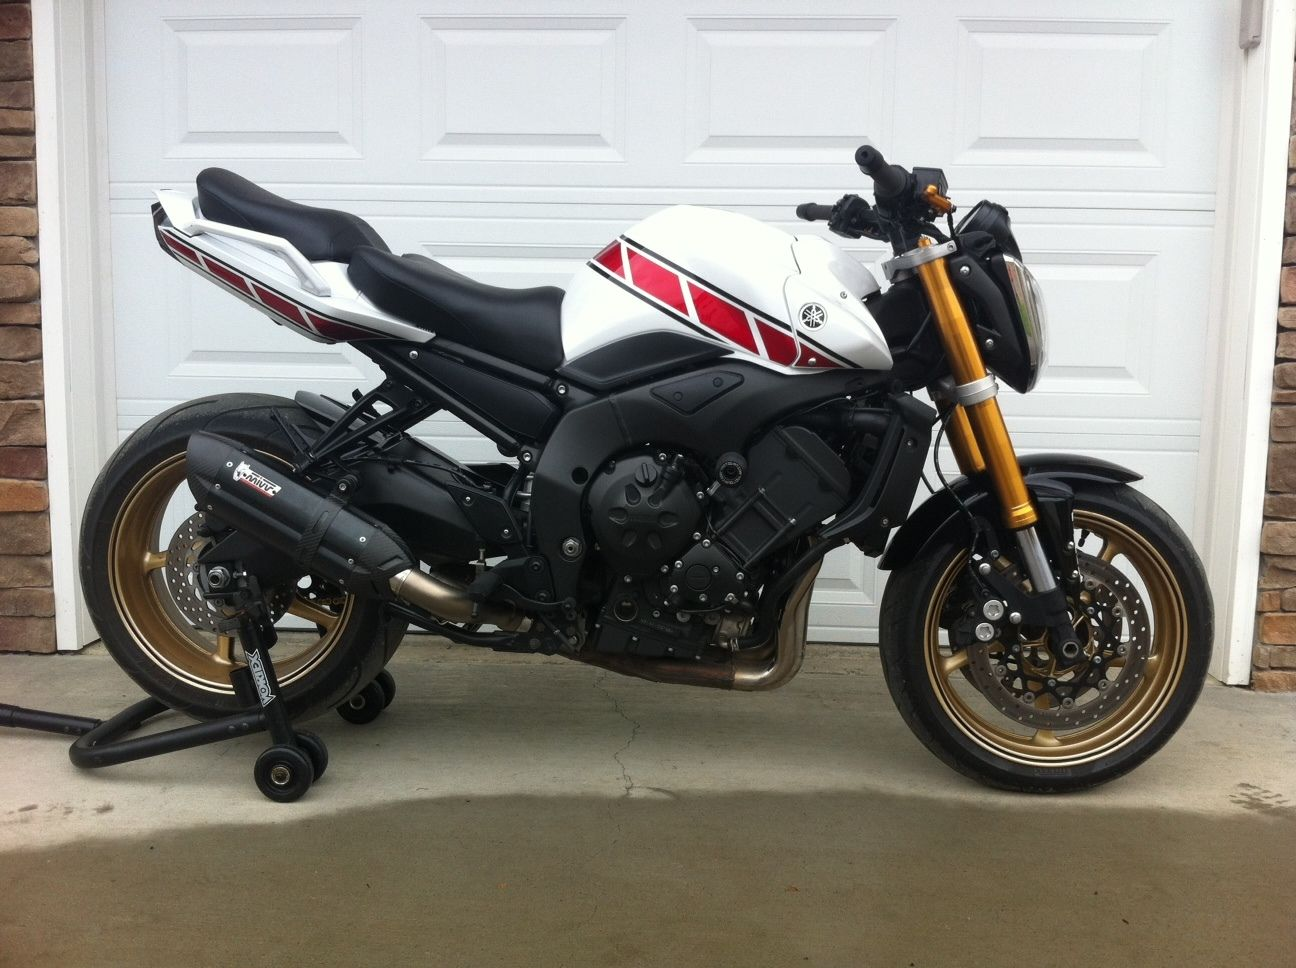 Yamaha FZ1 N 2014 **150bhp naked with Racefit exhaust